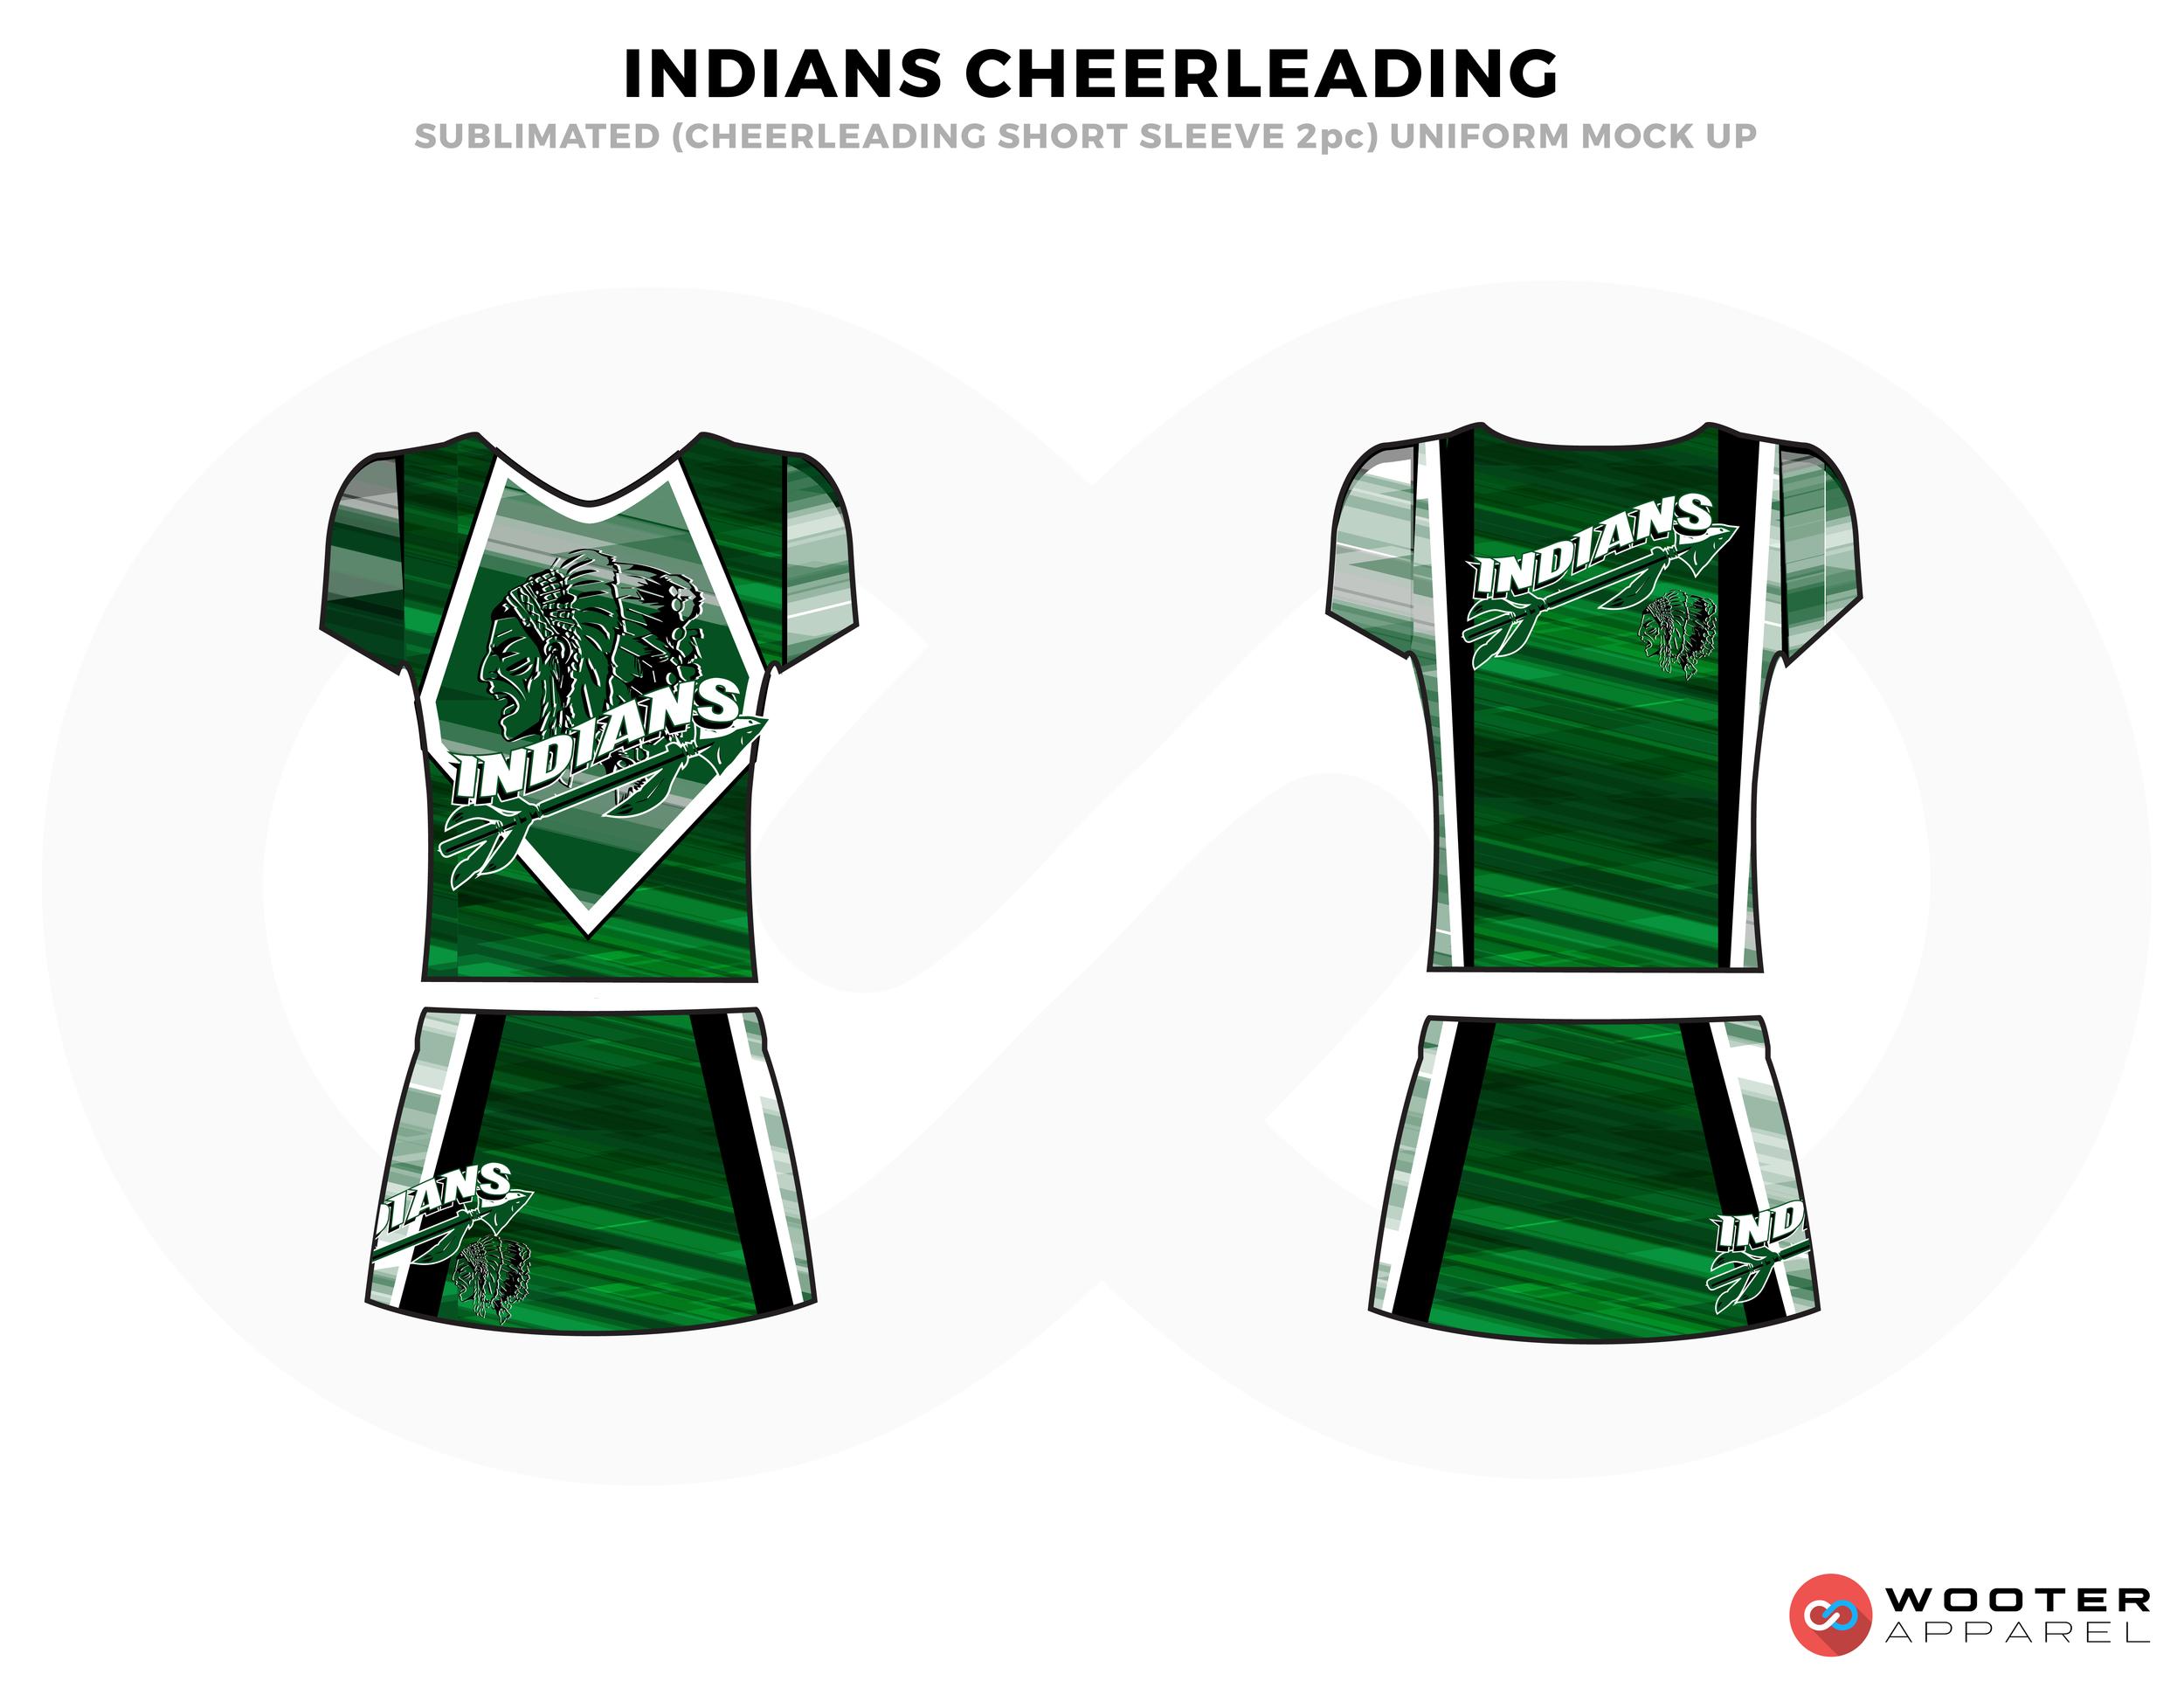 INDIANS CHEERLEADING green white cheerleading uniforms, top, and skirt